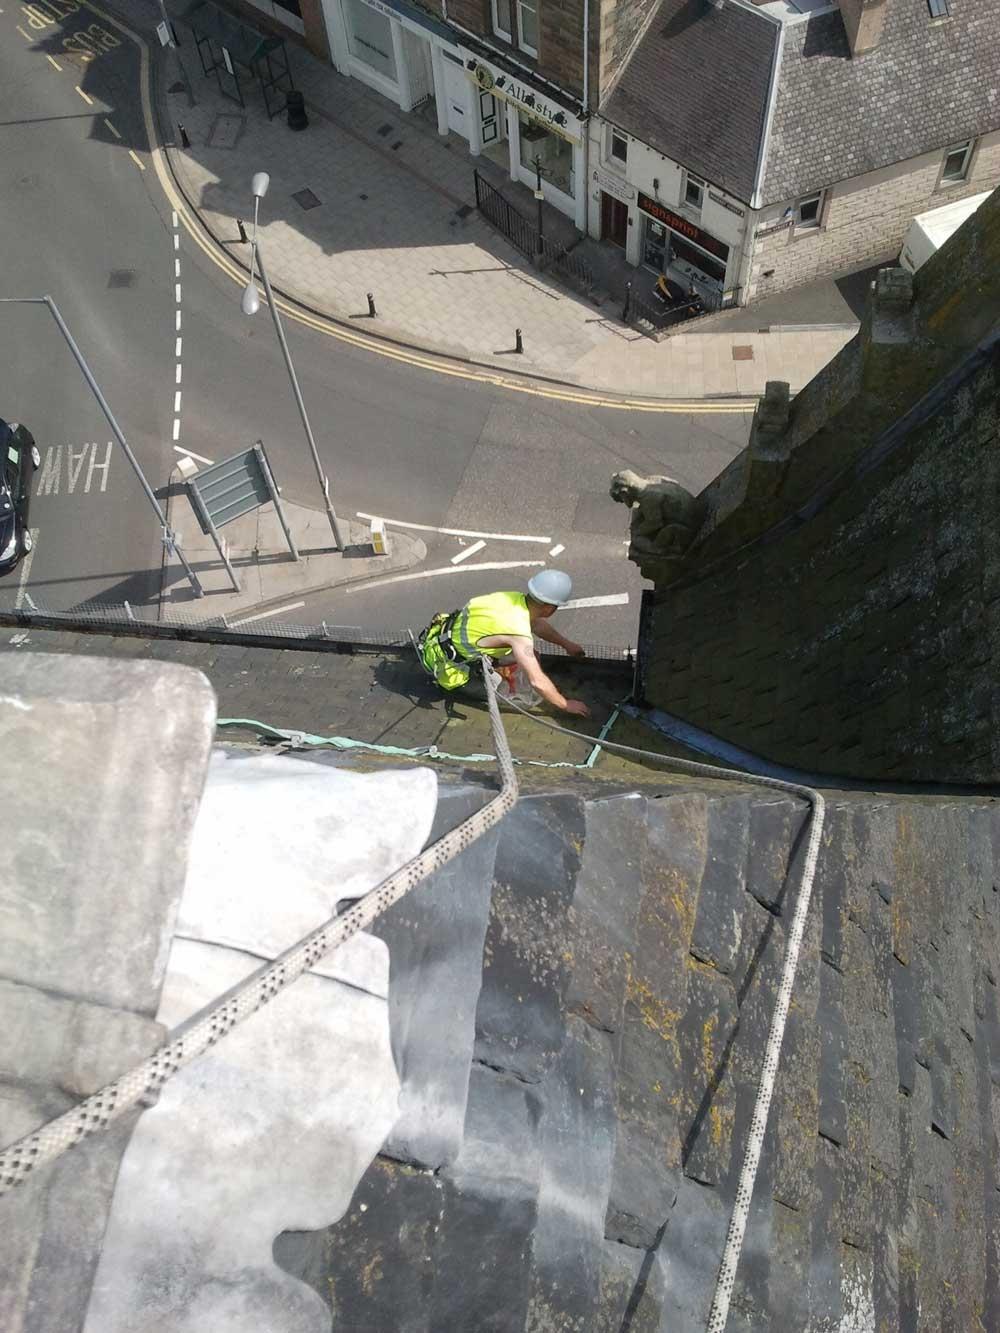 Abseil access - gutter clearing 2